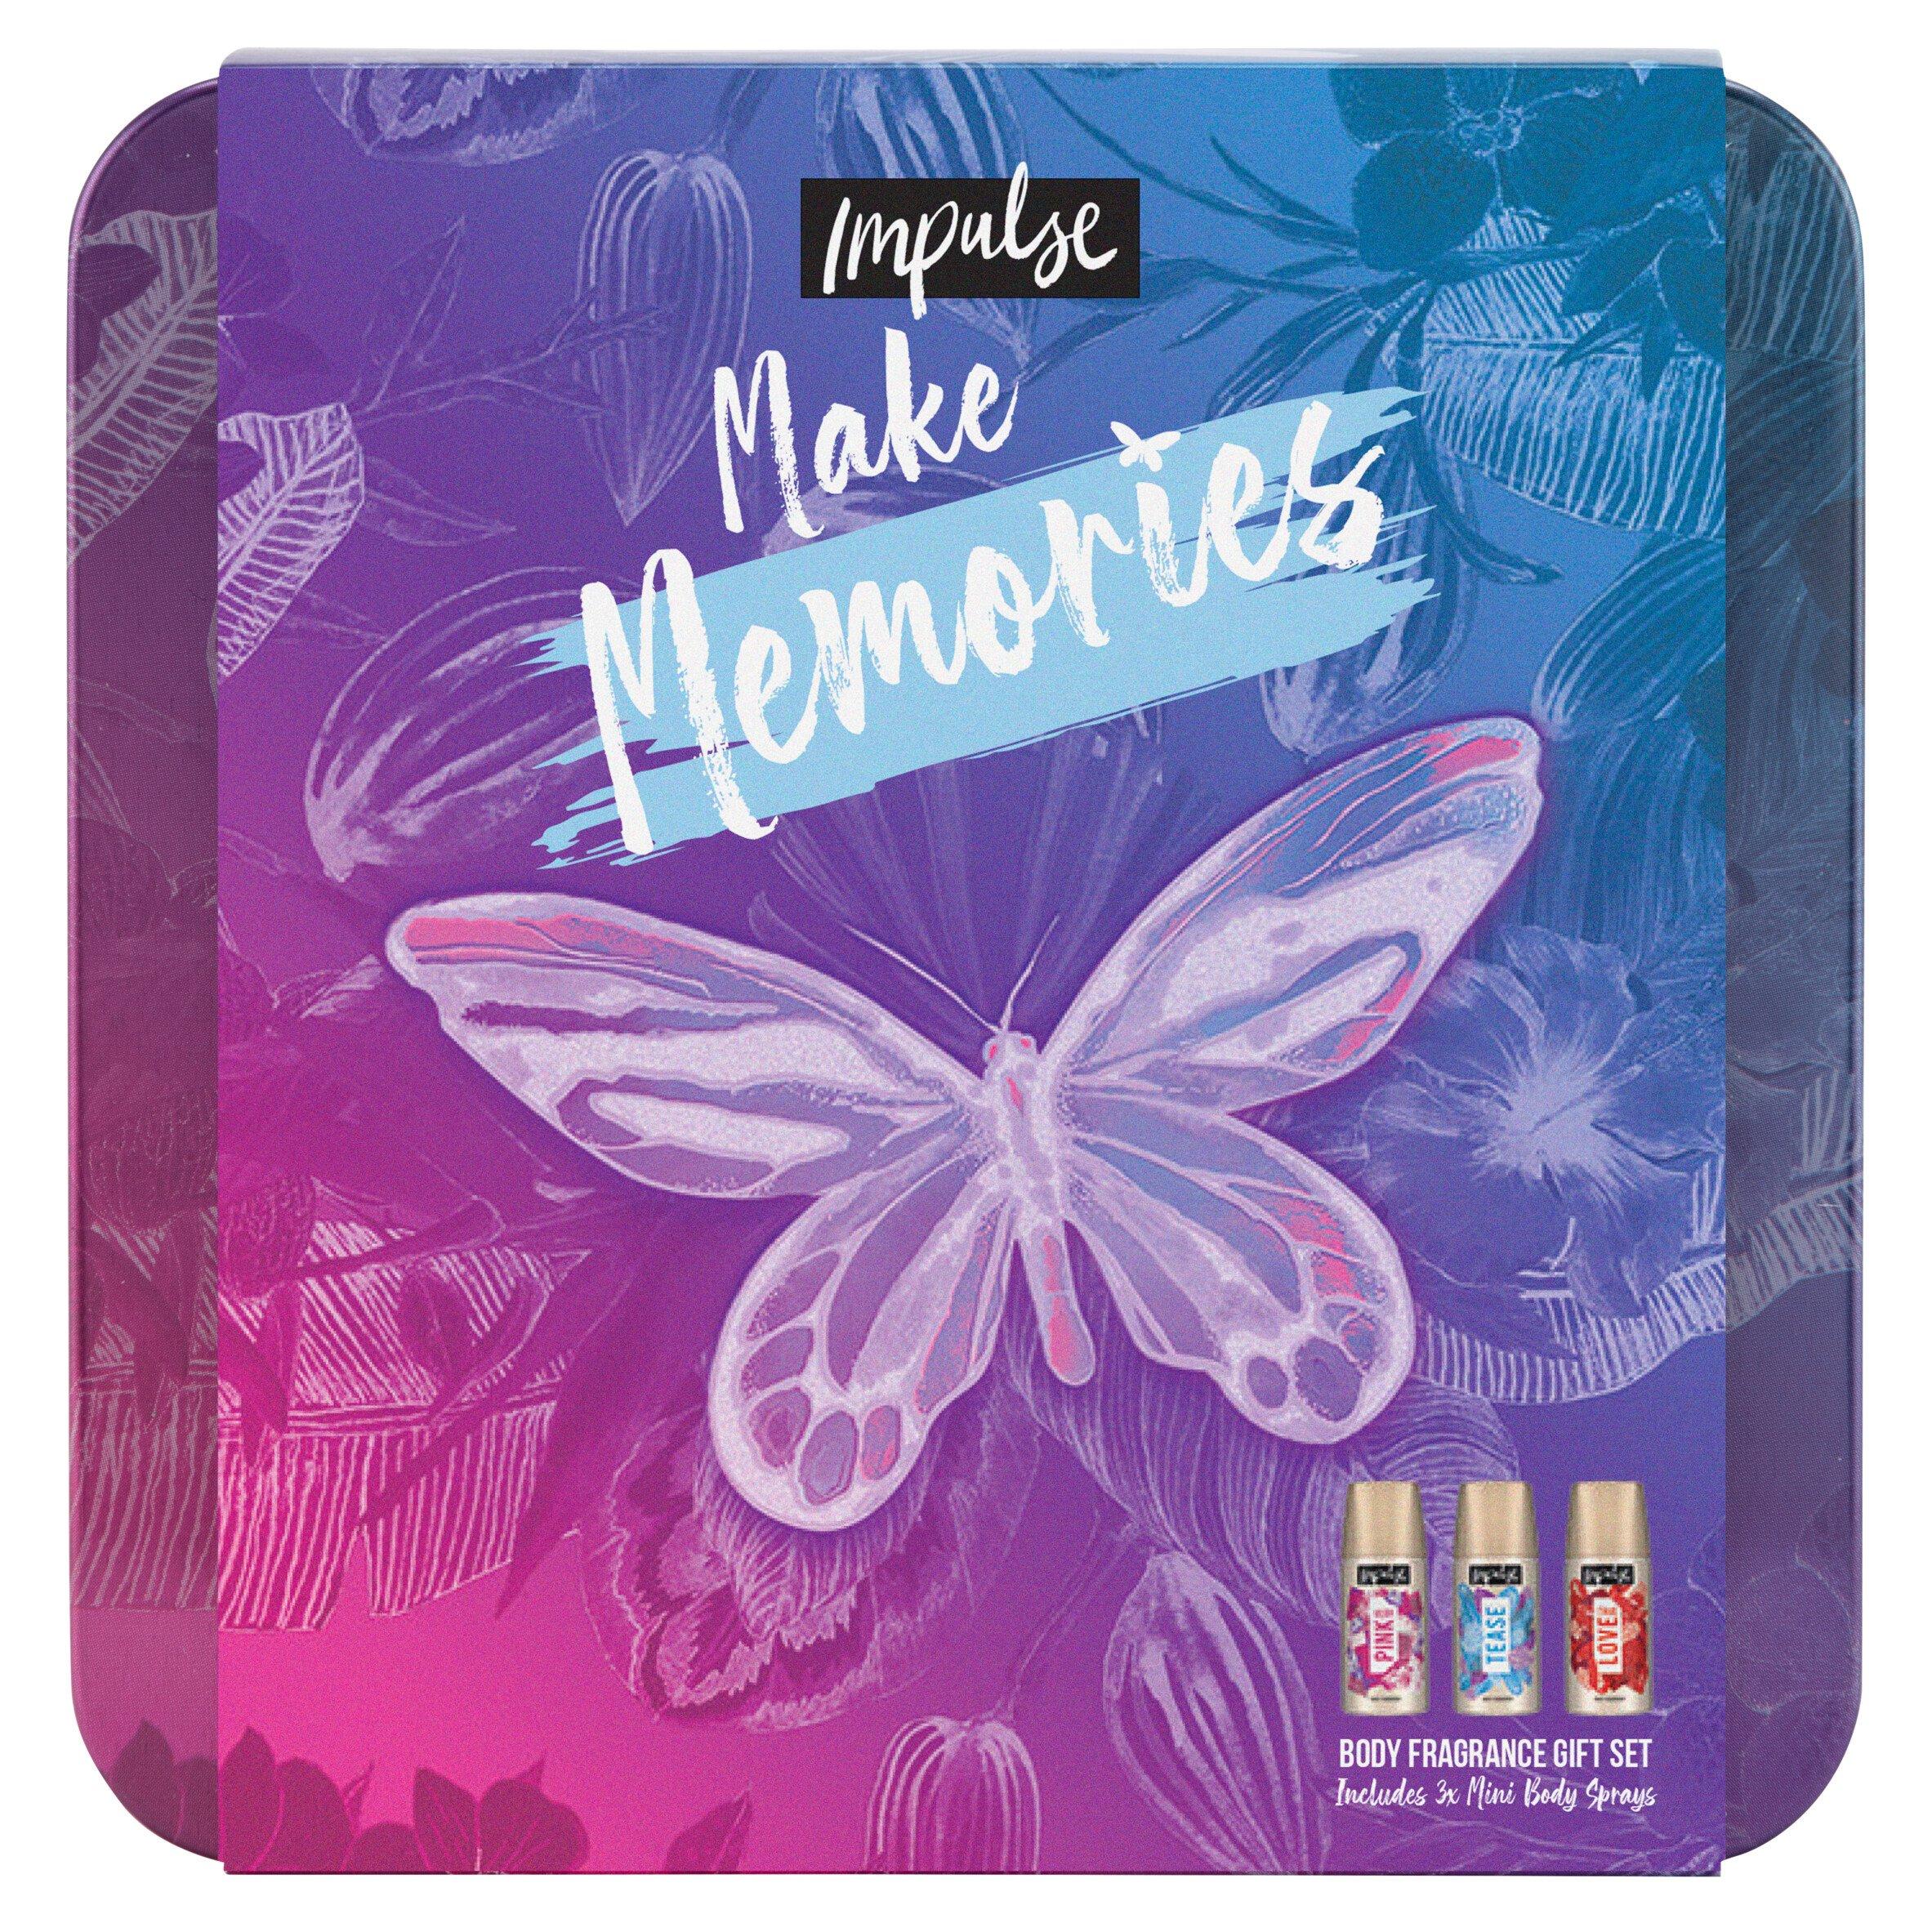 Impulse Make Memories Body Fragrance Set 3X35ml